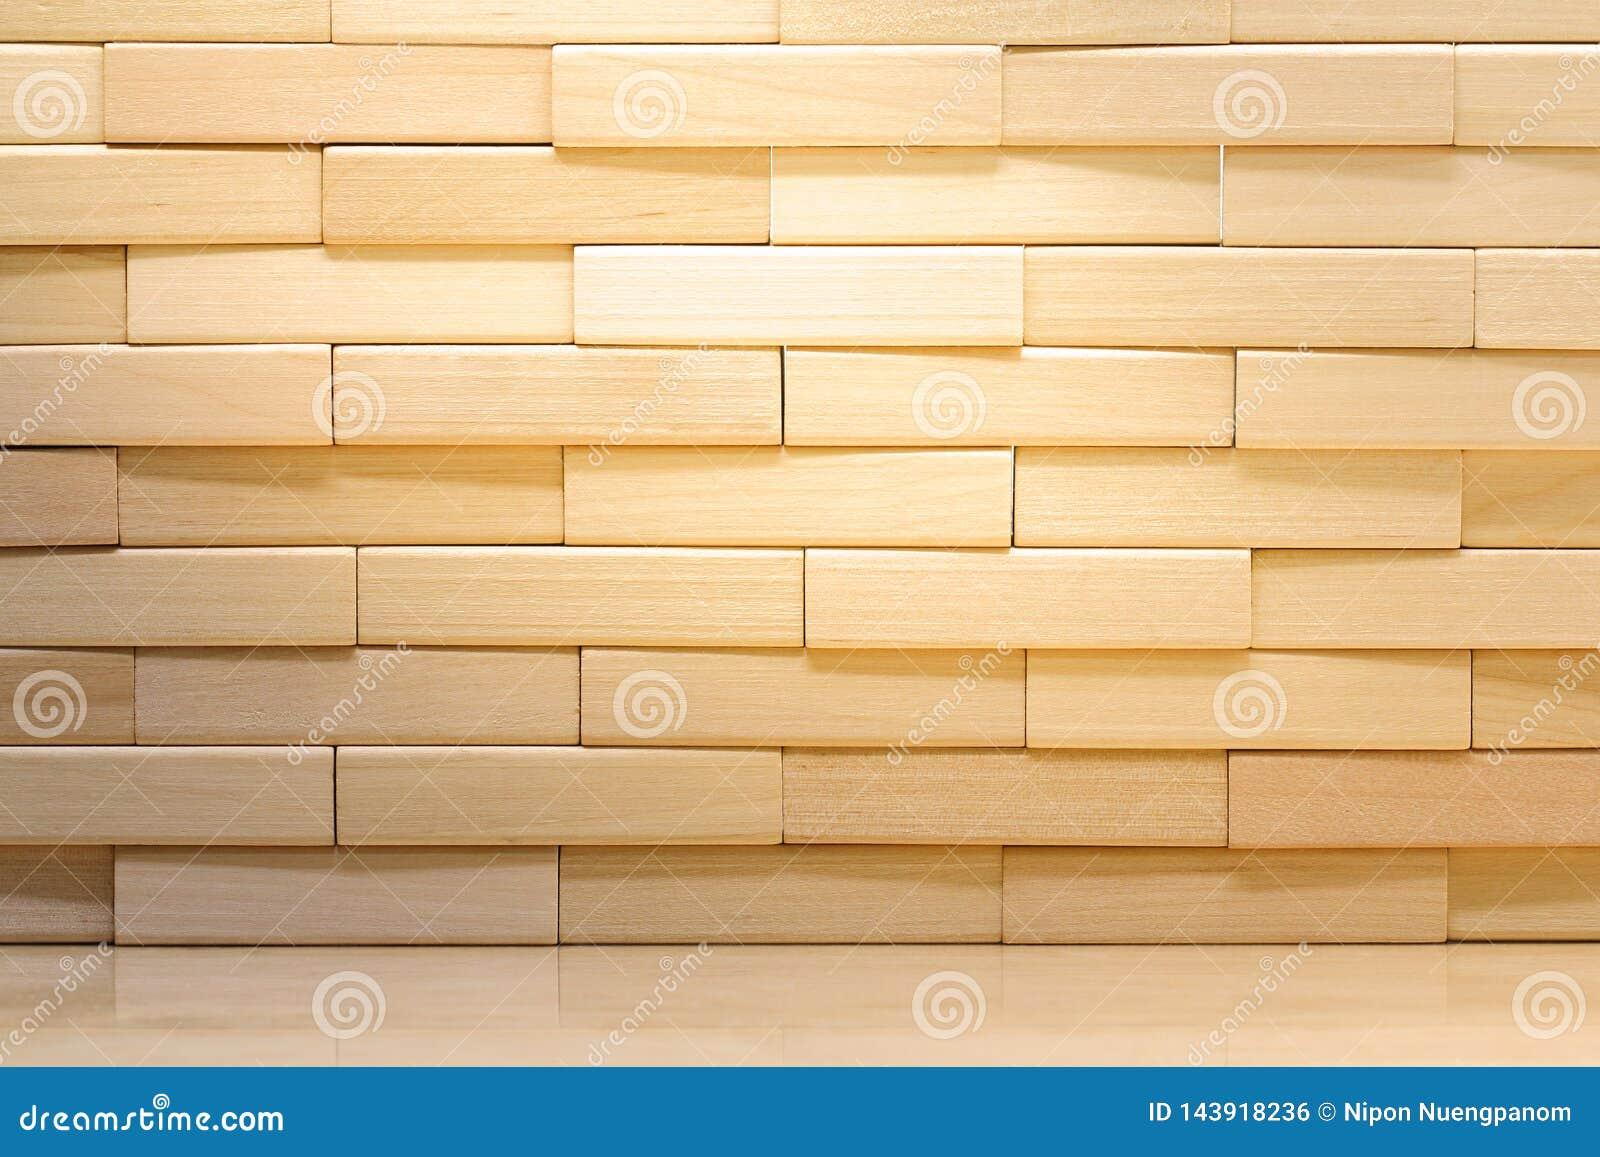 Parede de tijolo de madeira feita dos blocos de madeira